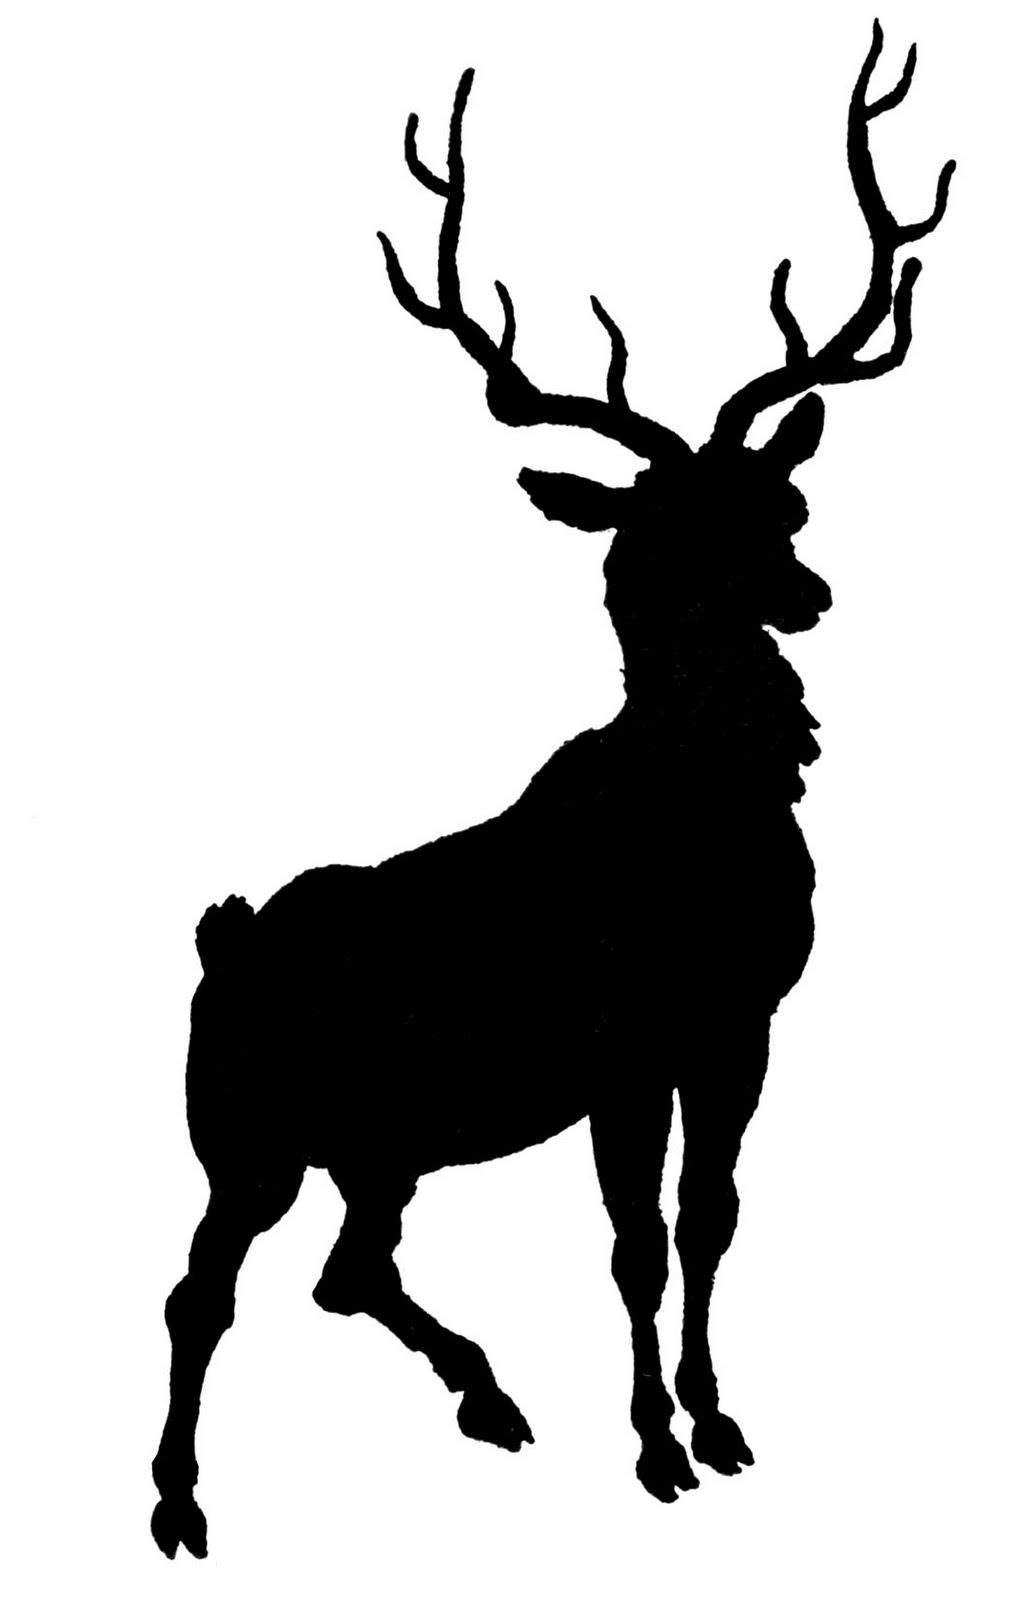 1032x1600 Deer Silhouette Clip Art Car Tuning